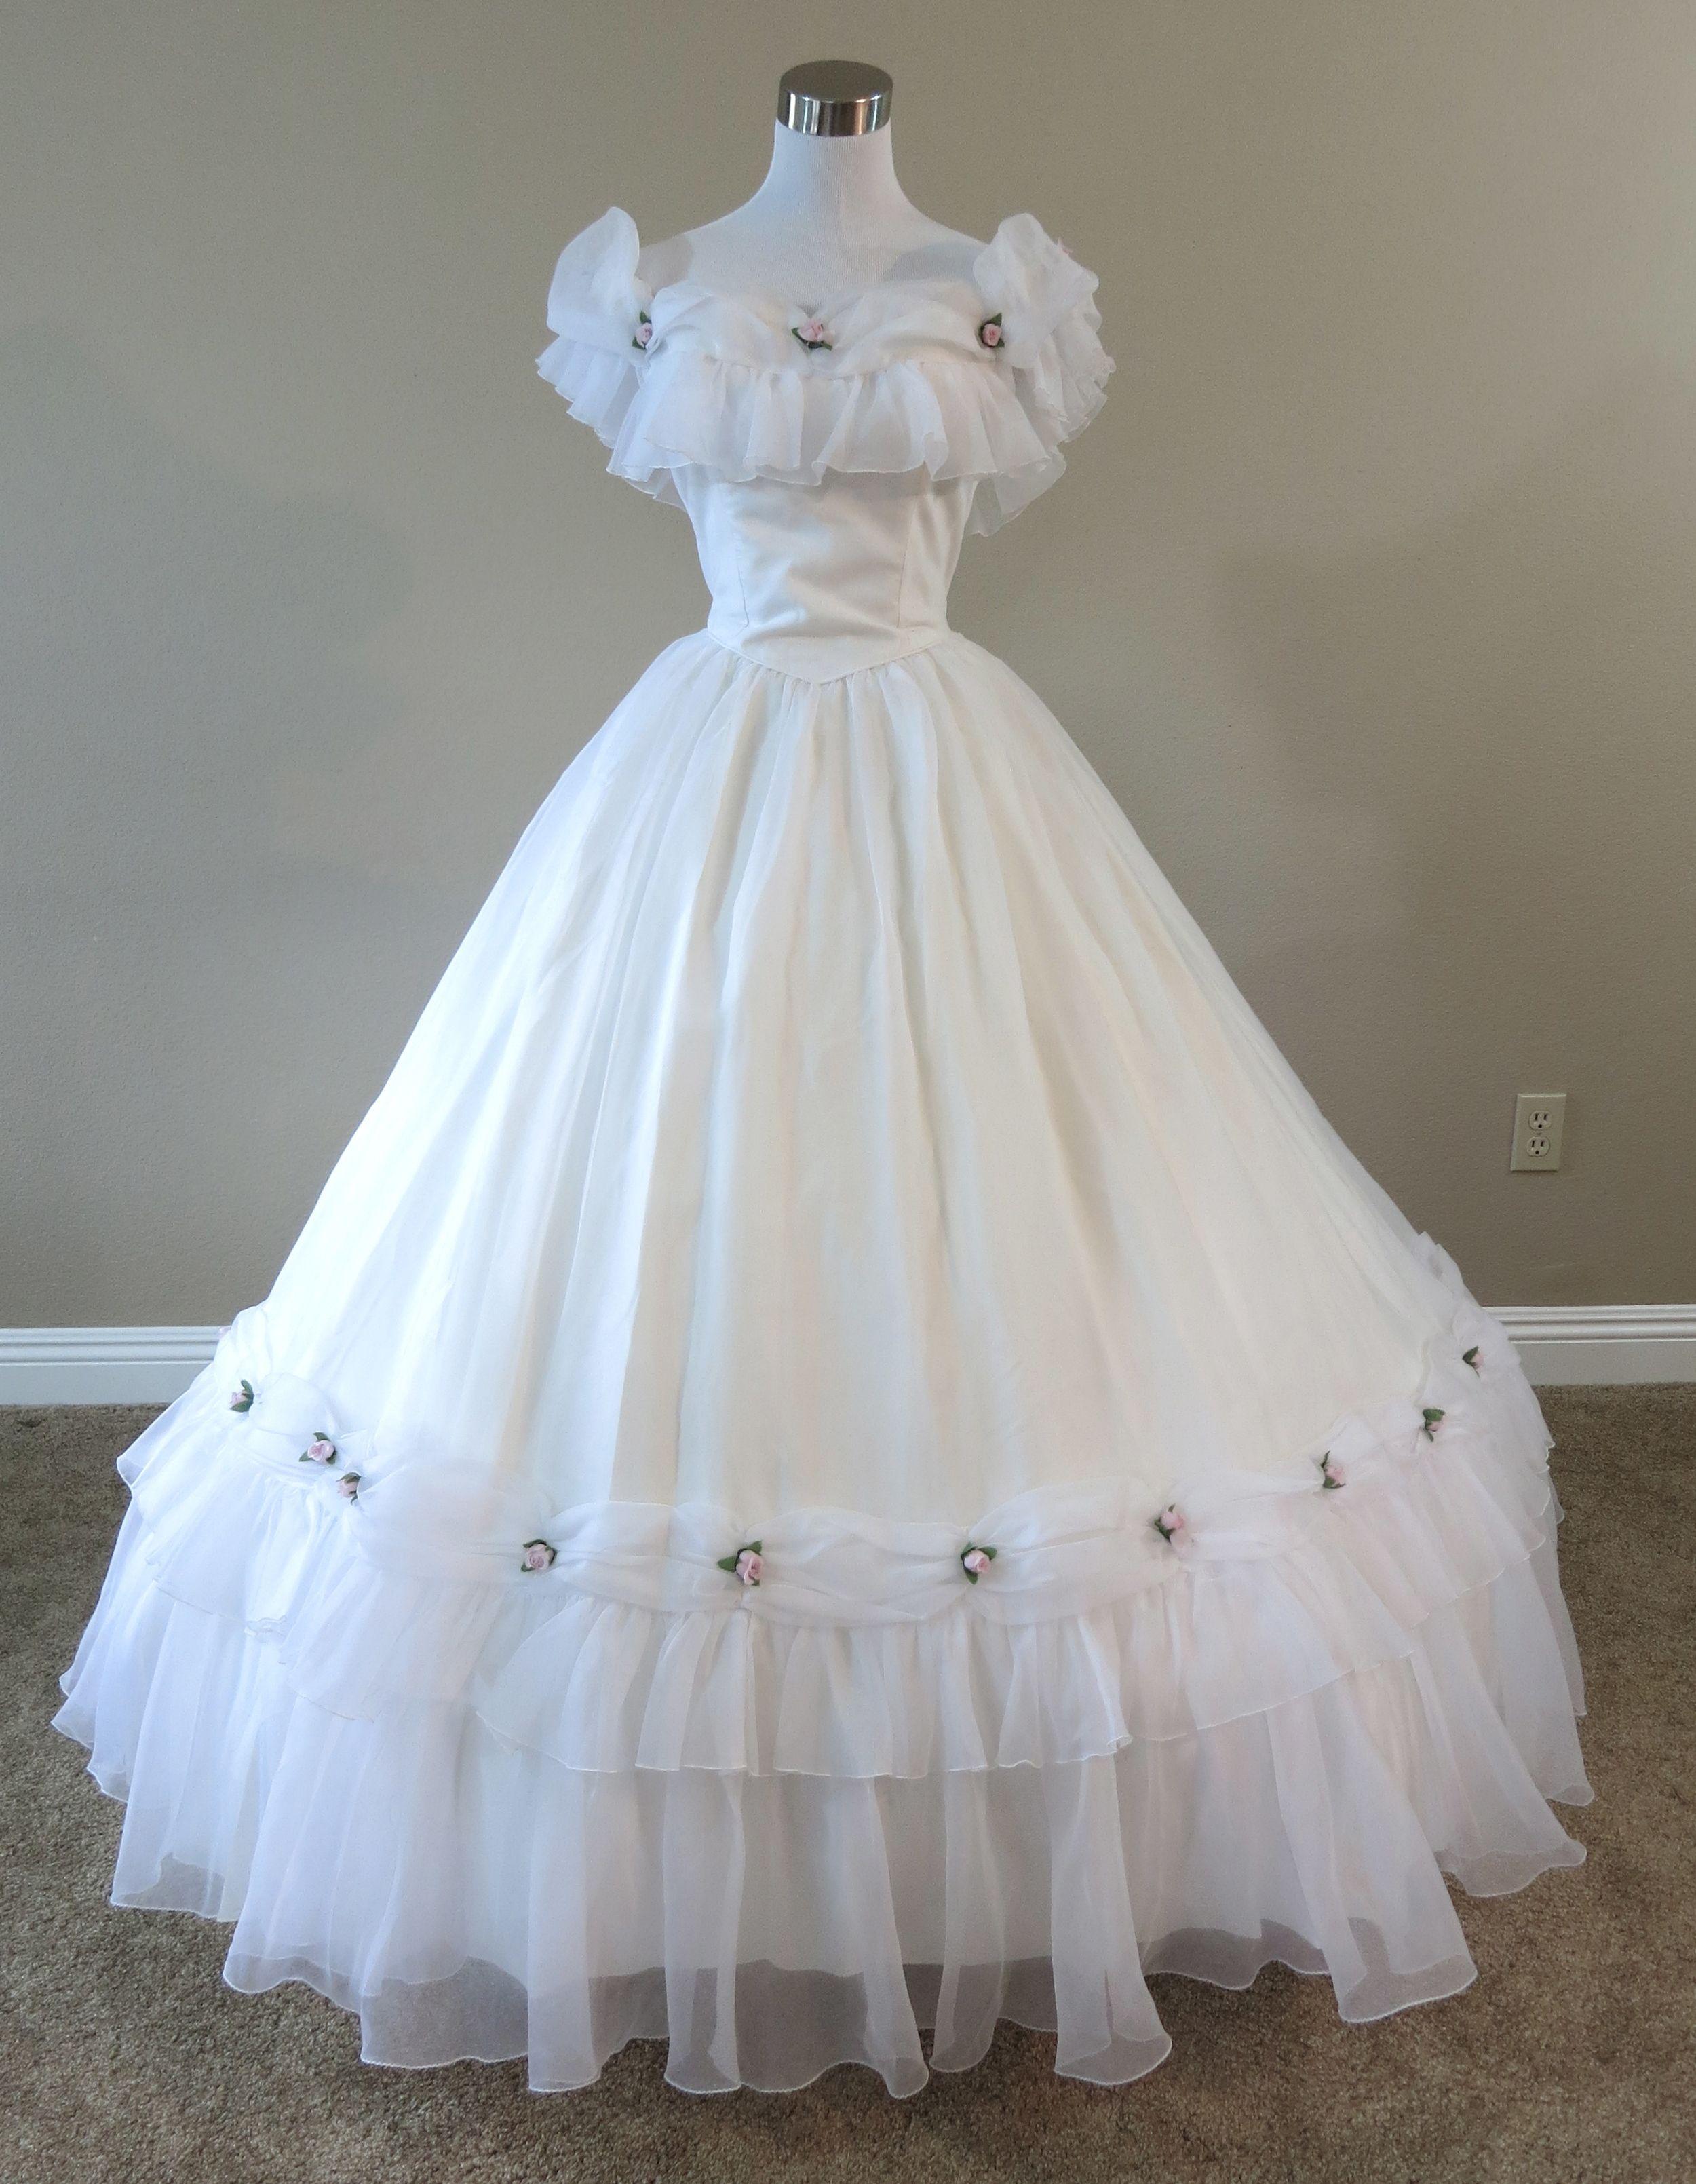 Pin by sue haslett on civil war era pinterest civil wars gowns